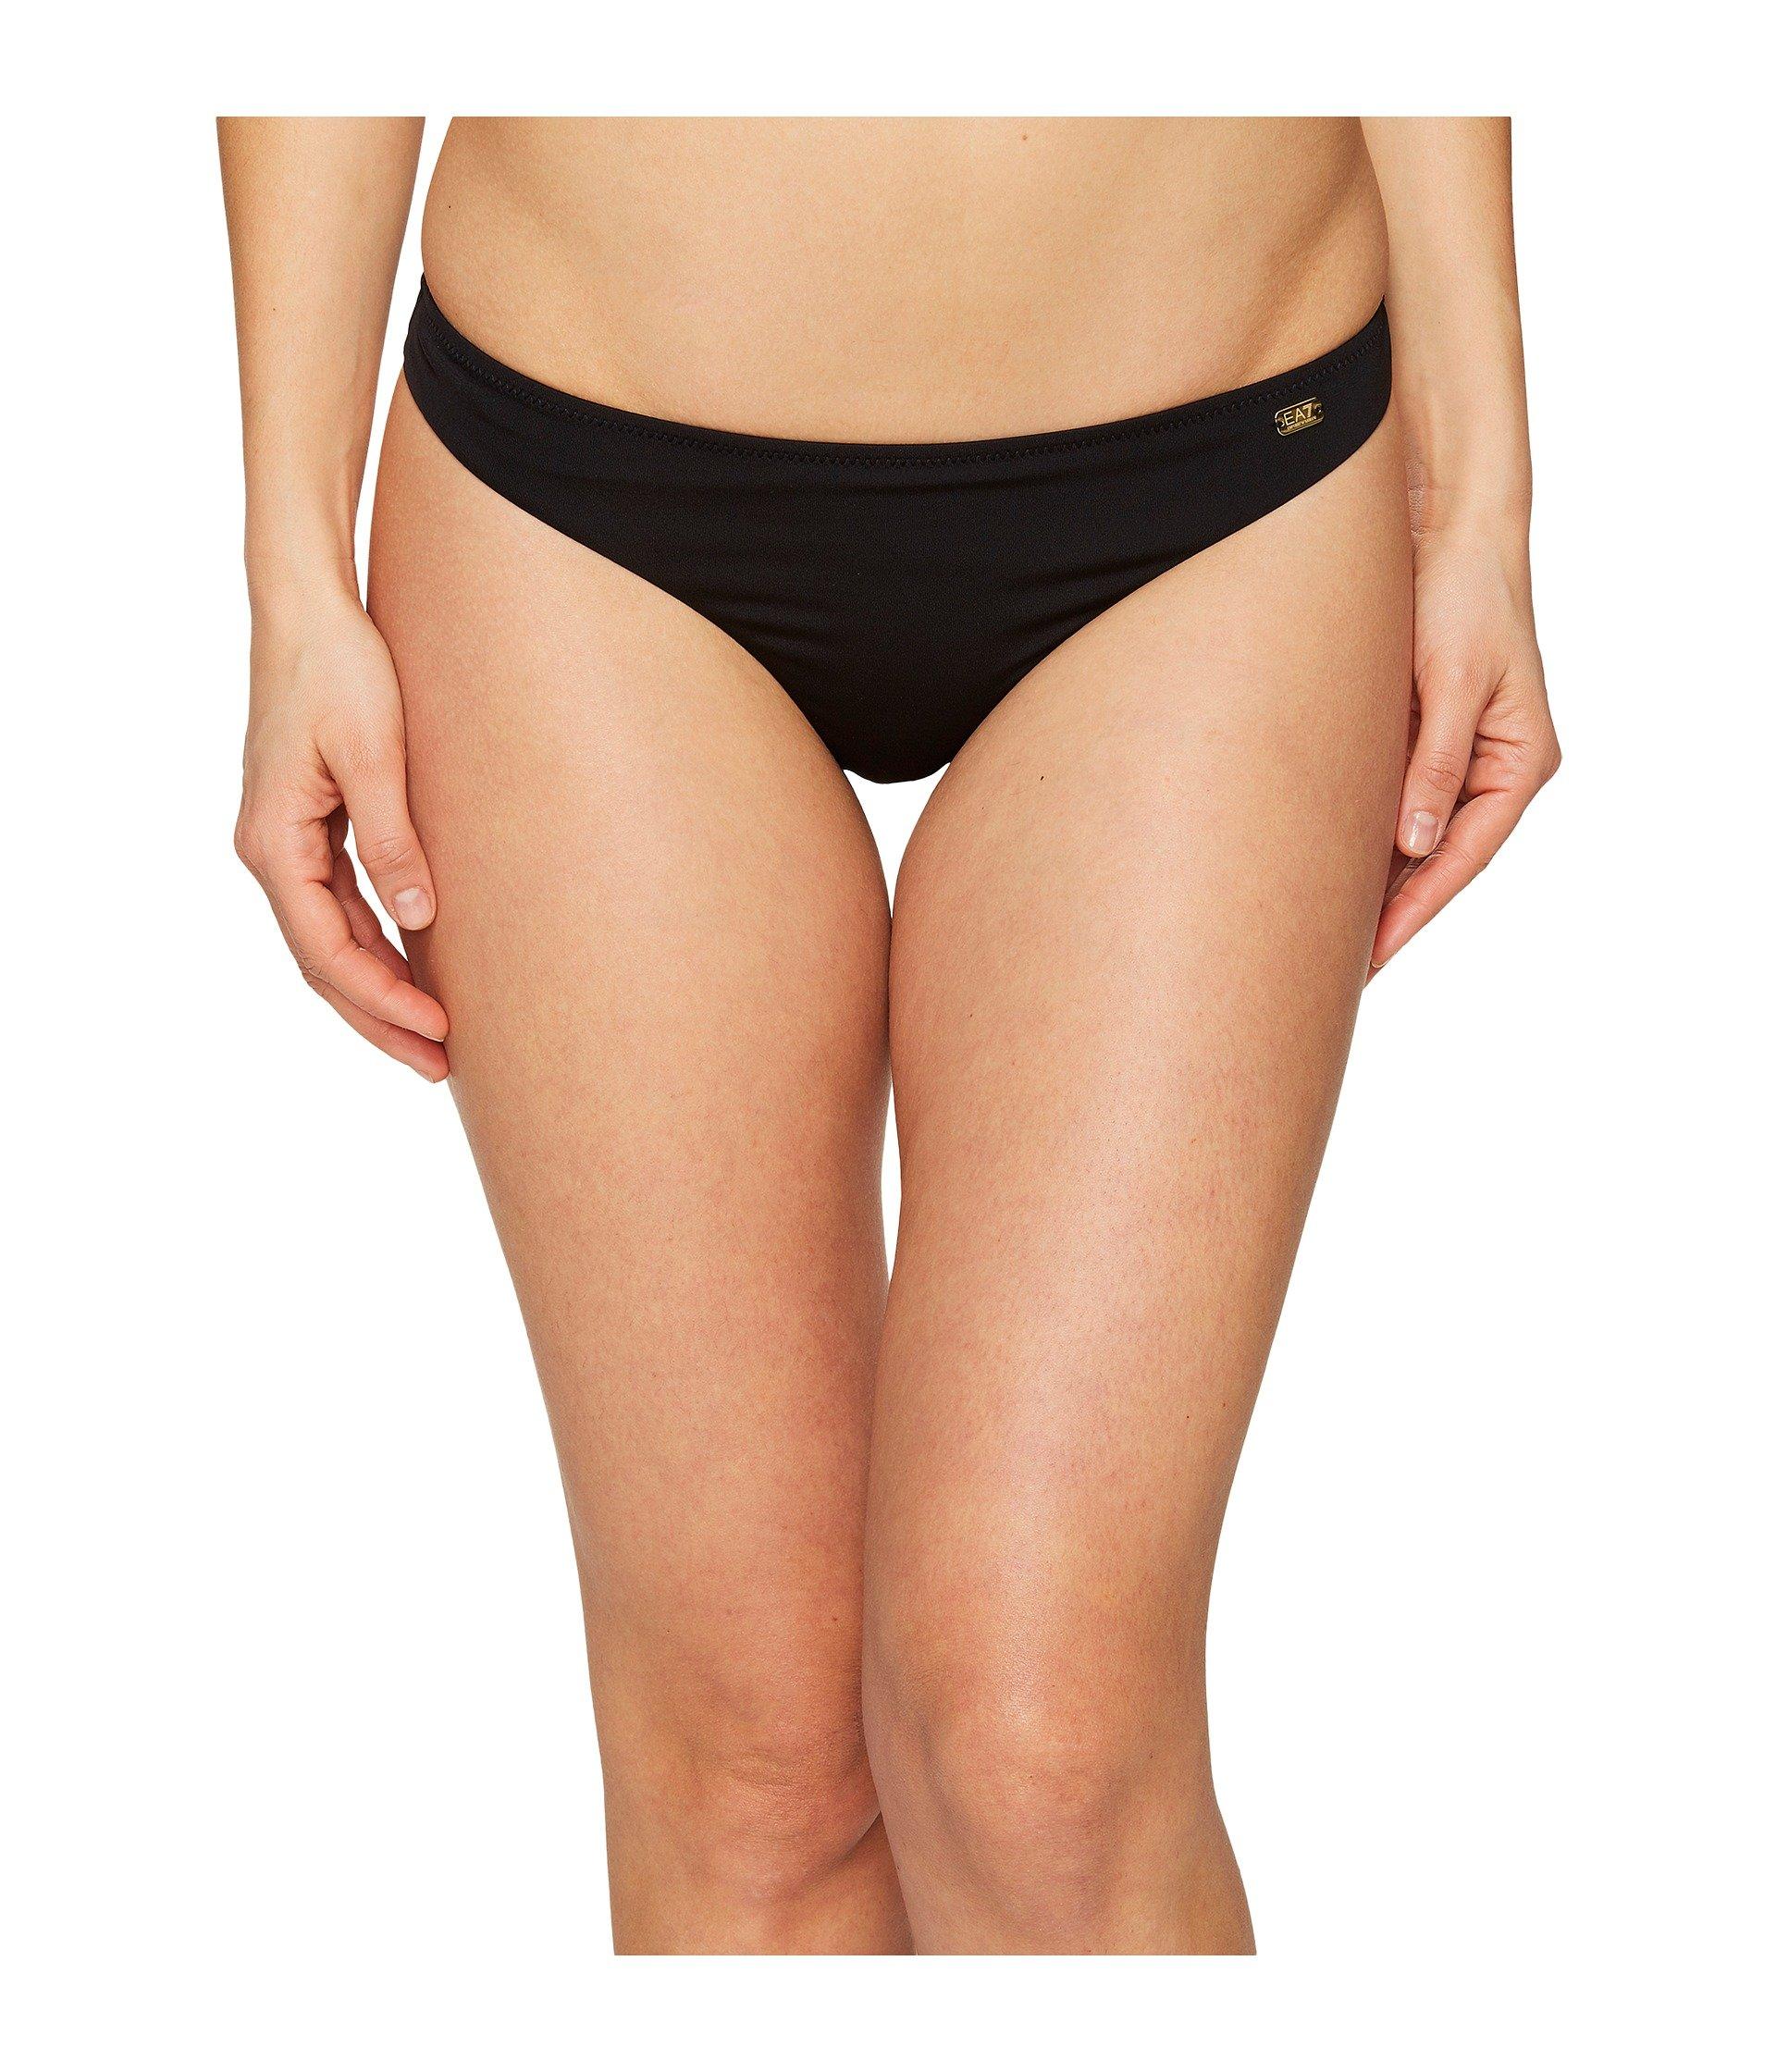 Bikini para Mujer Emporio Armani Seaworld Eagle Studs Brazilian Brief  + Emporio Armani en VeoyCompro.net